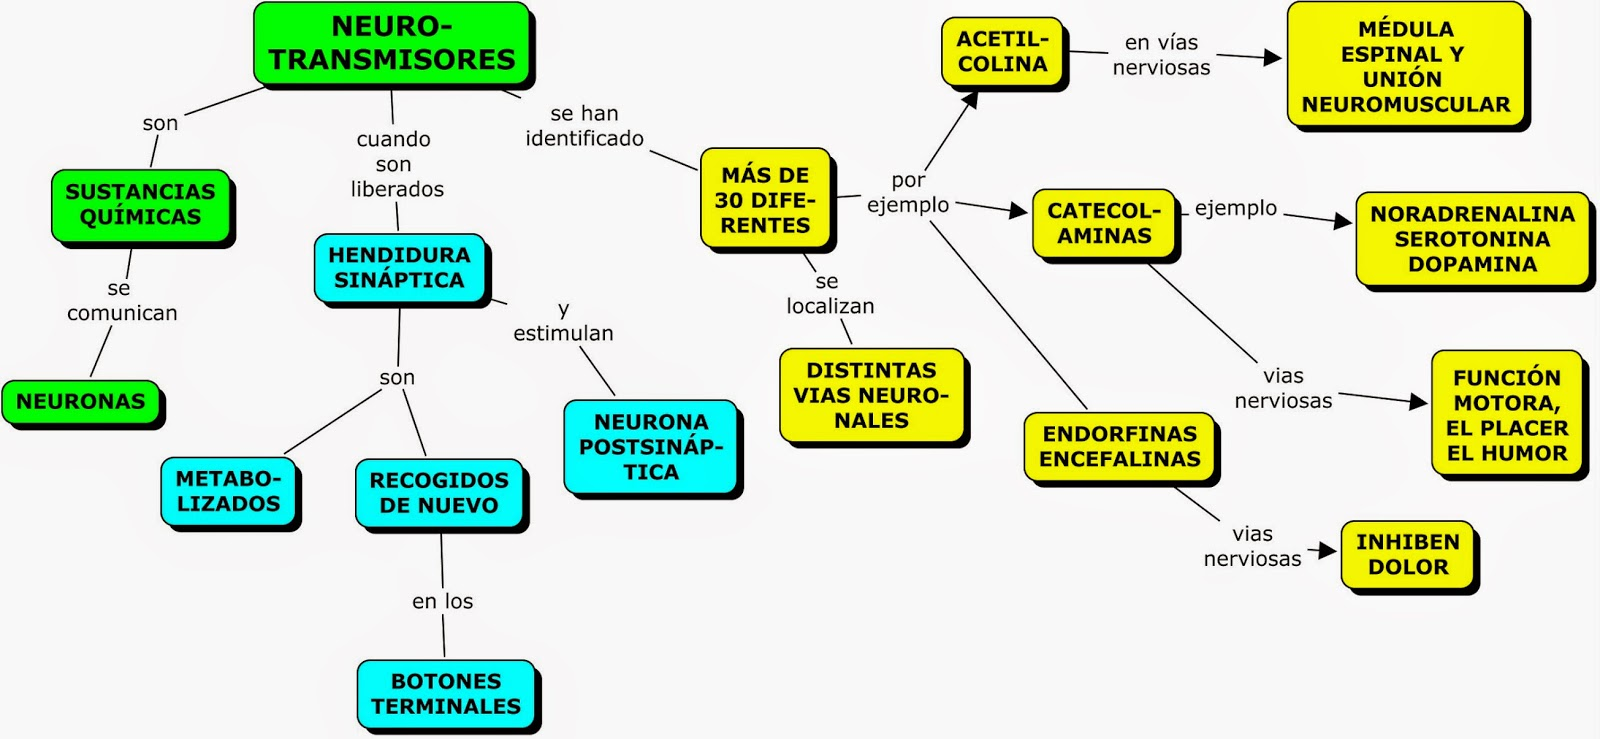 MAPA CONCEPTUAL DEL SISTEMA NERVIOSO CENTRAL | MAPAS CONCEPTUALES ...